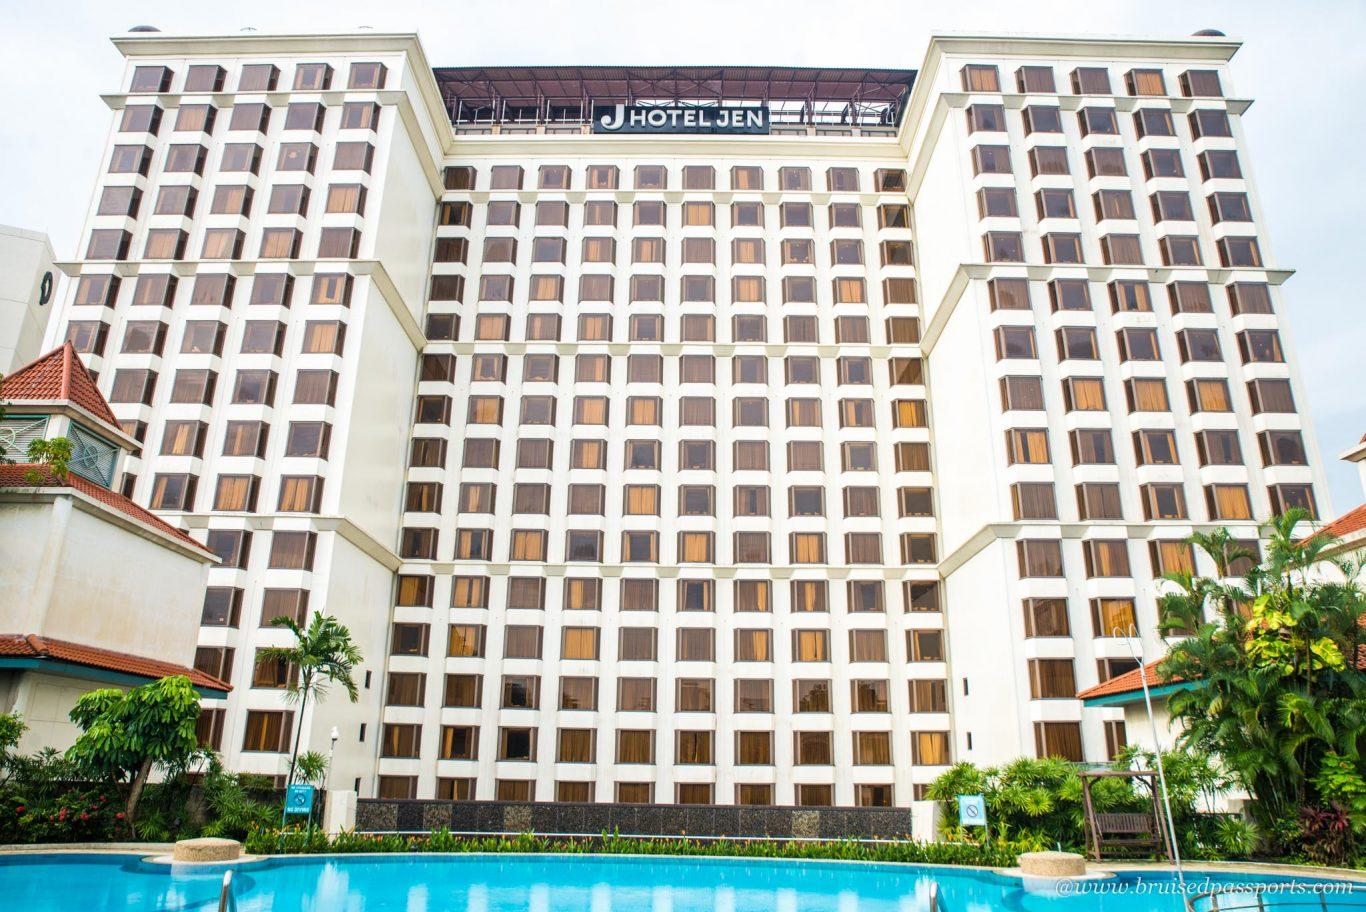 swimming pool at Hotel jen Tanglin Singapore